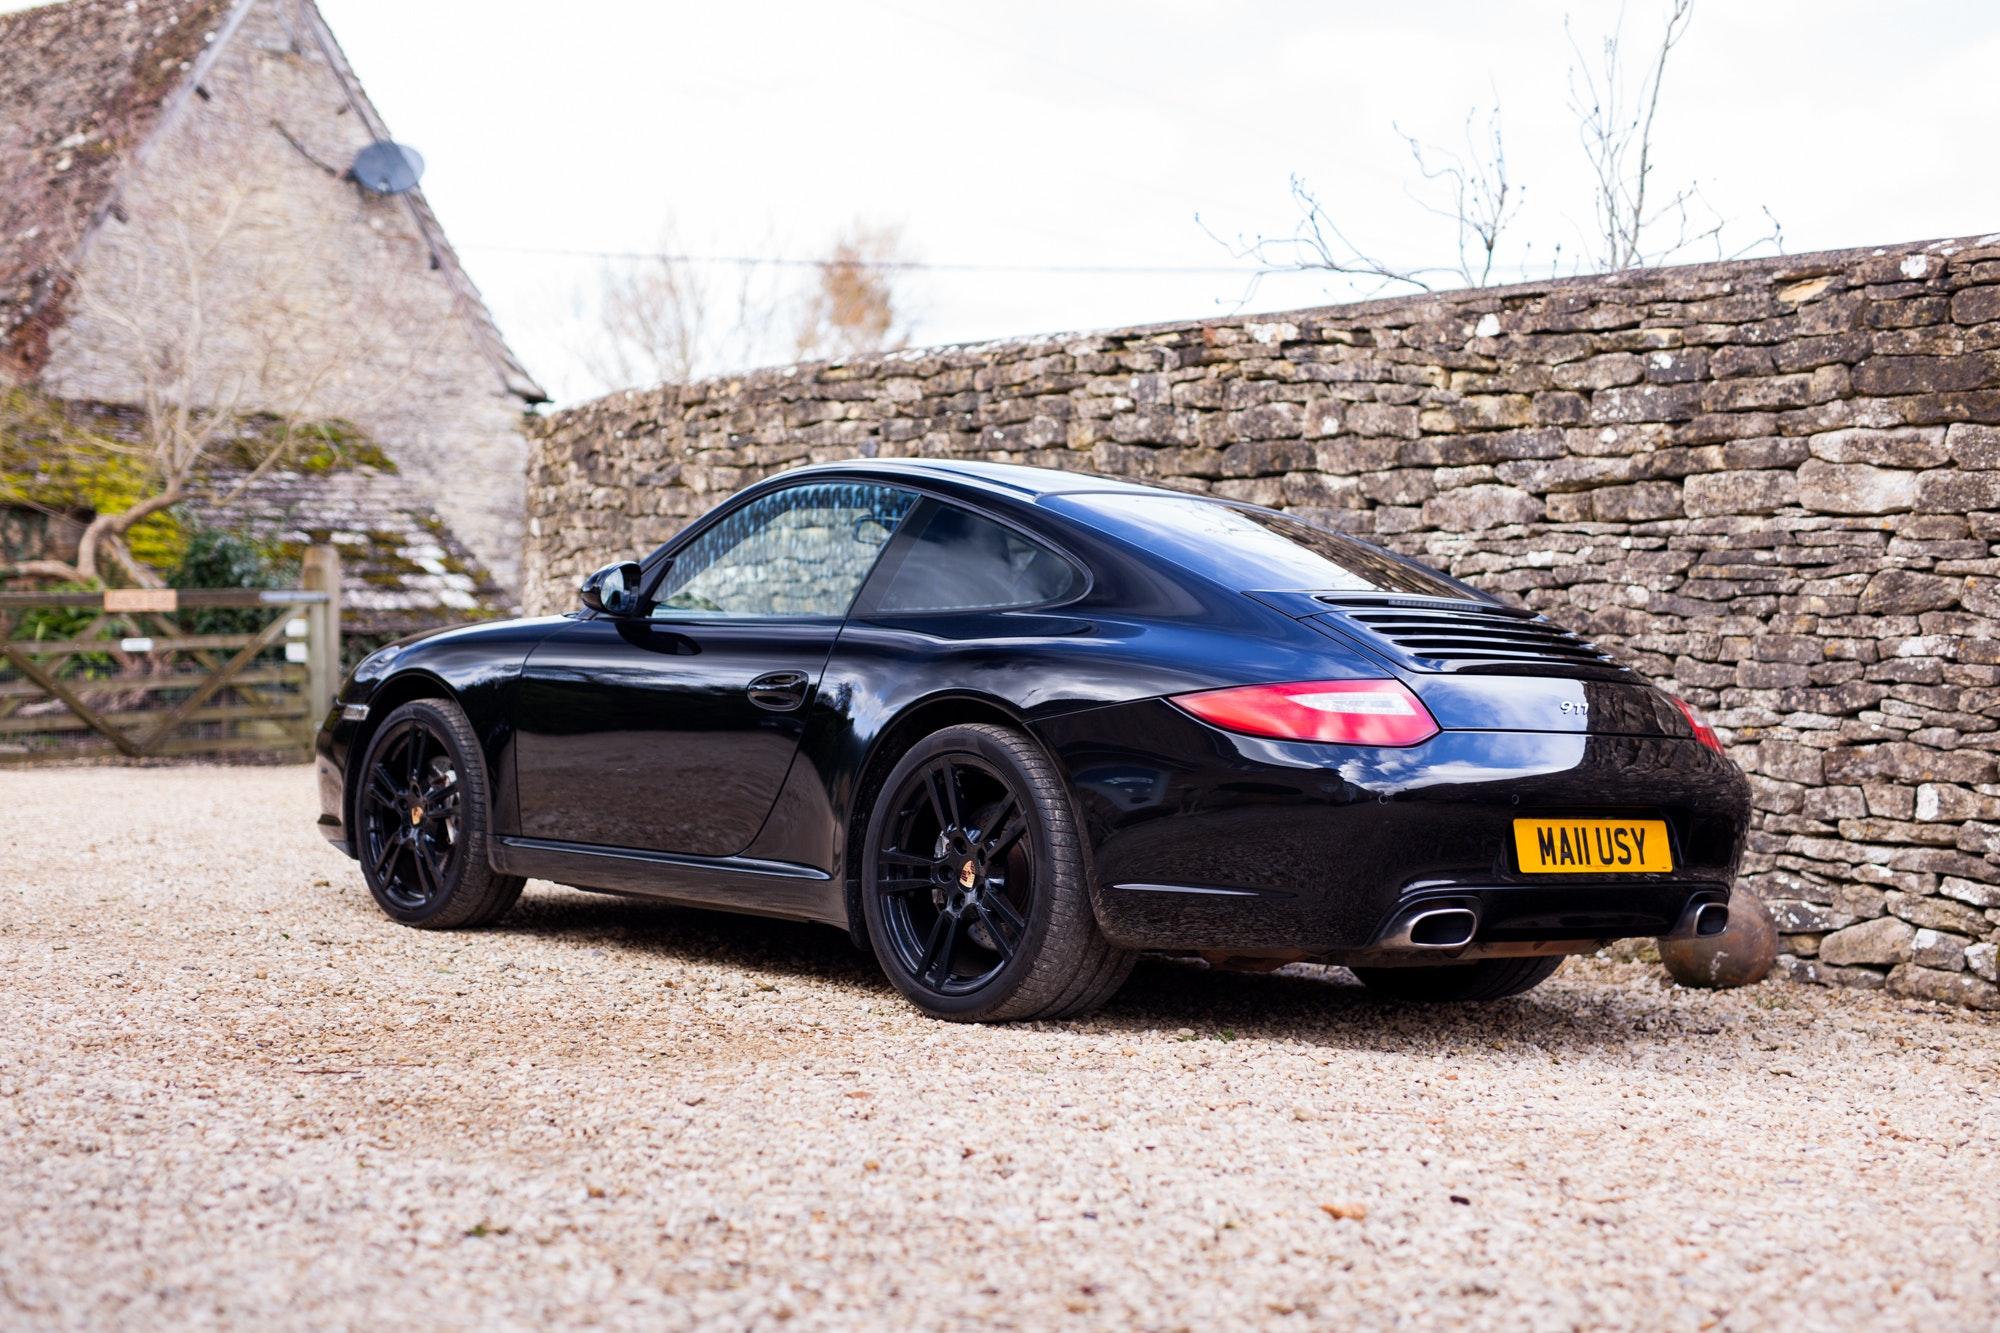 2011 Porsche 911 997 Black Edition